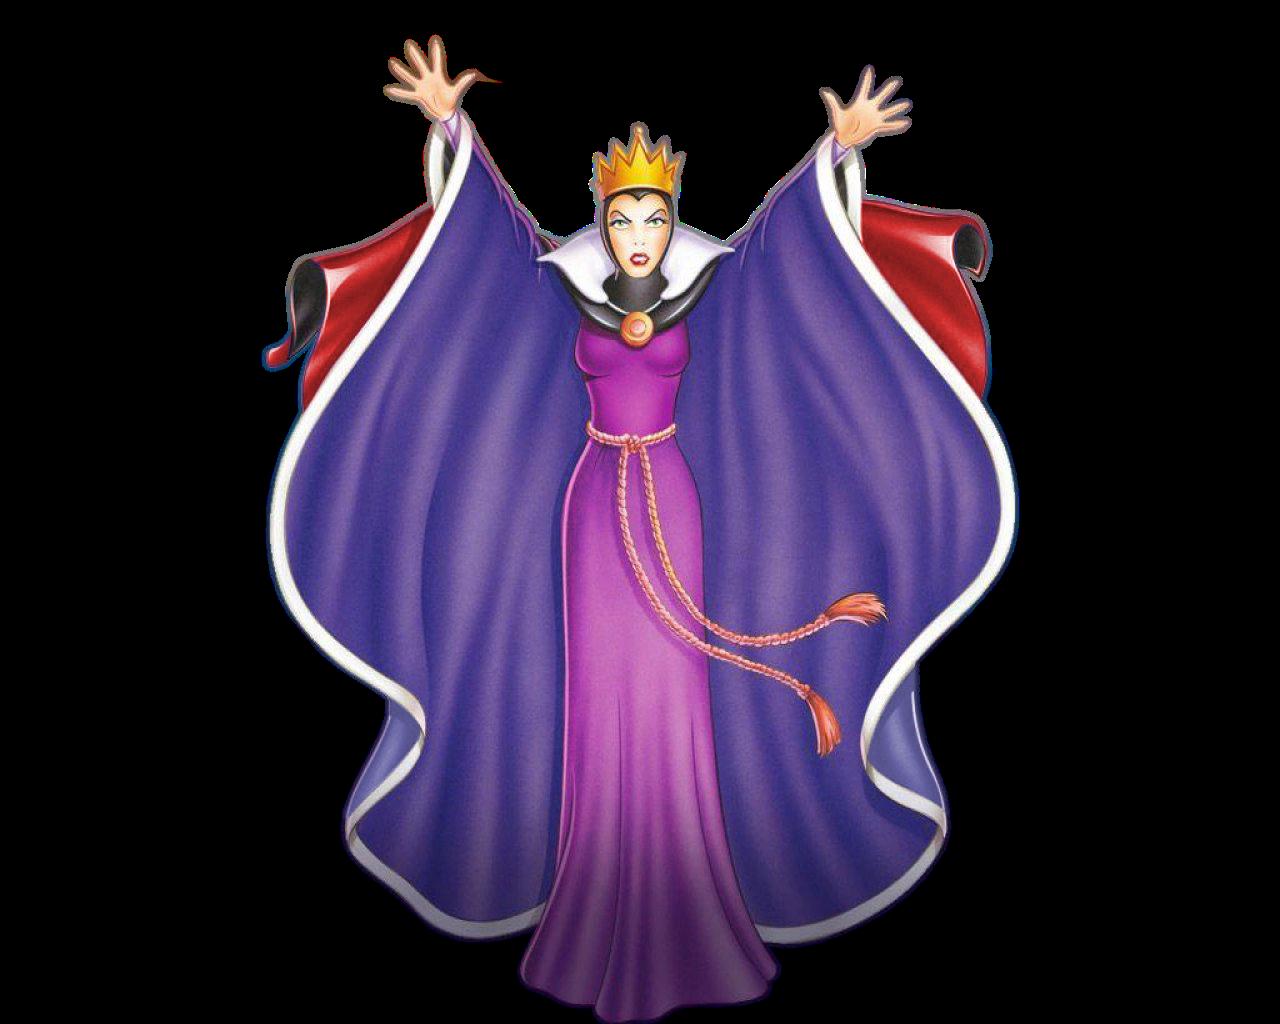 Queen clipart evil queen. A very merry un